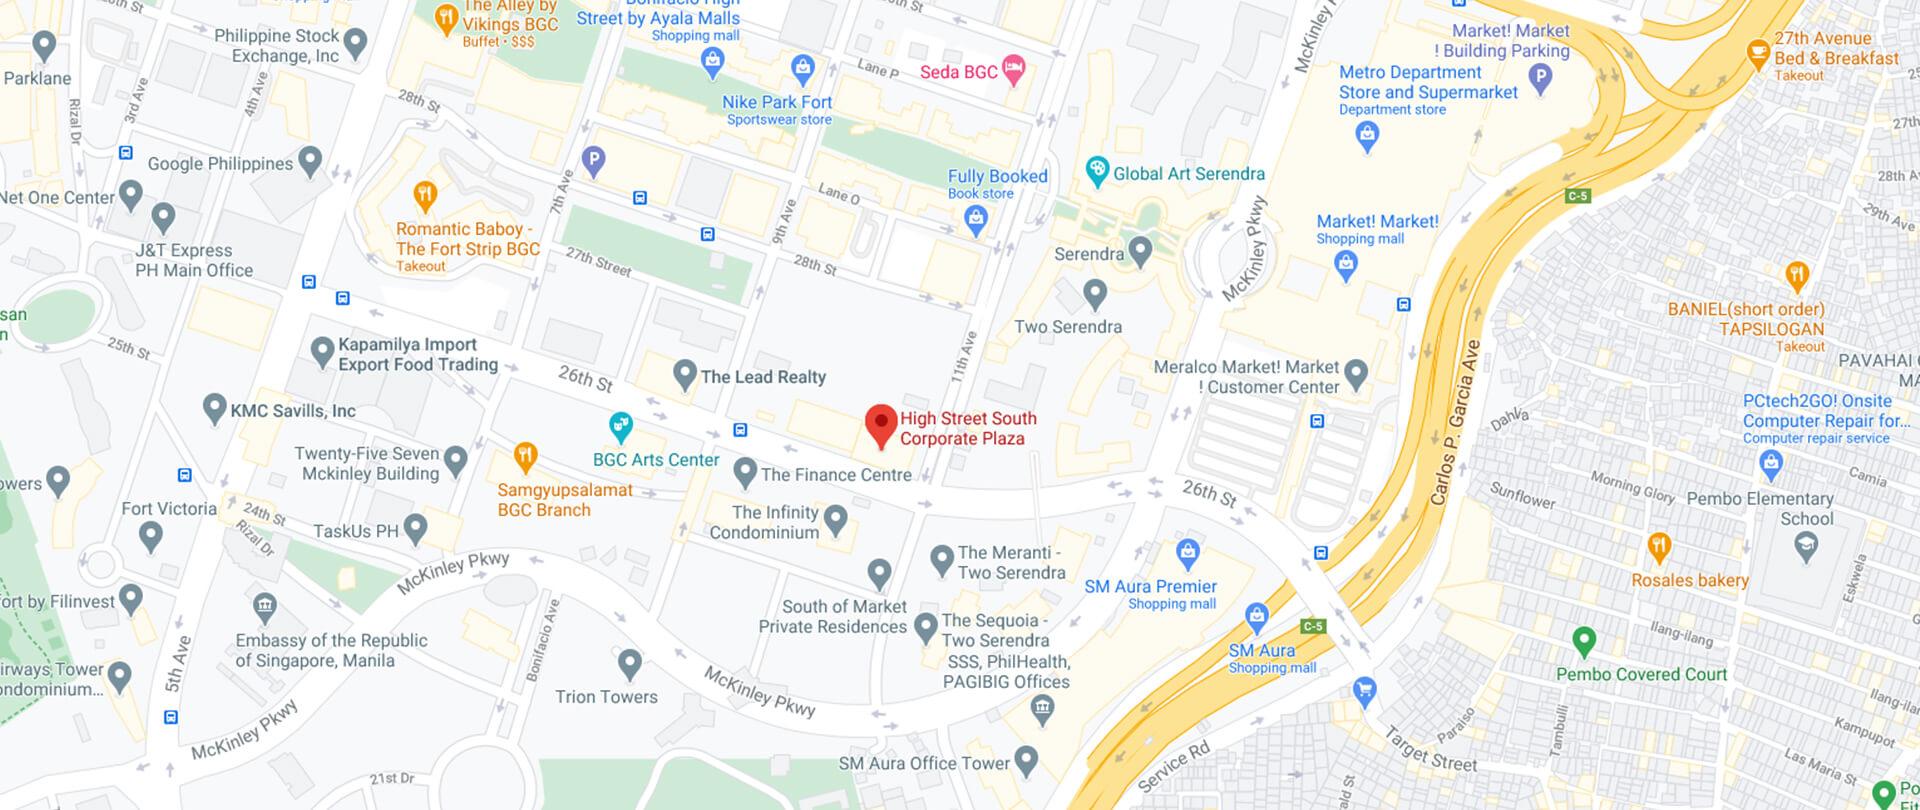 LifeScience Center Address